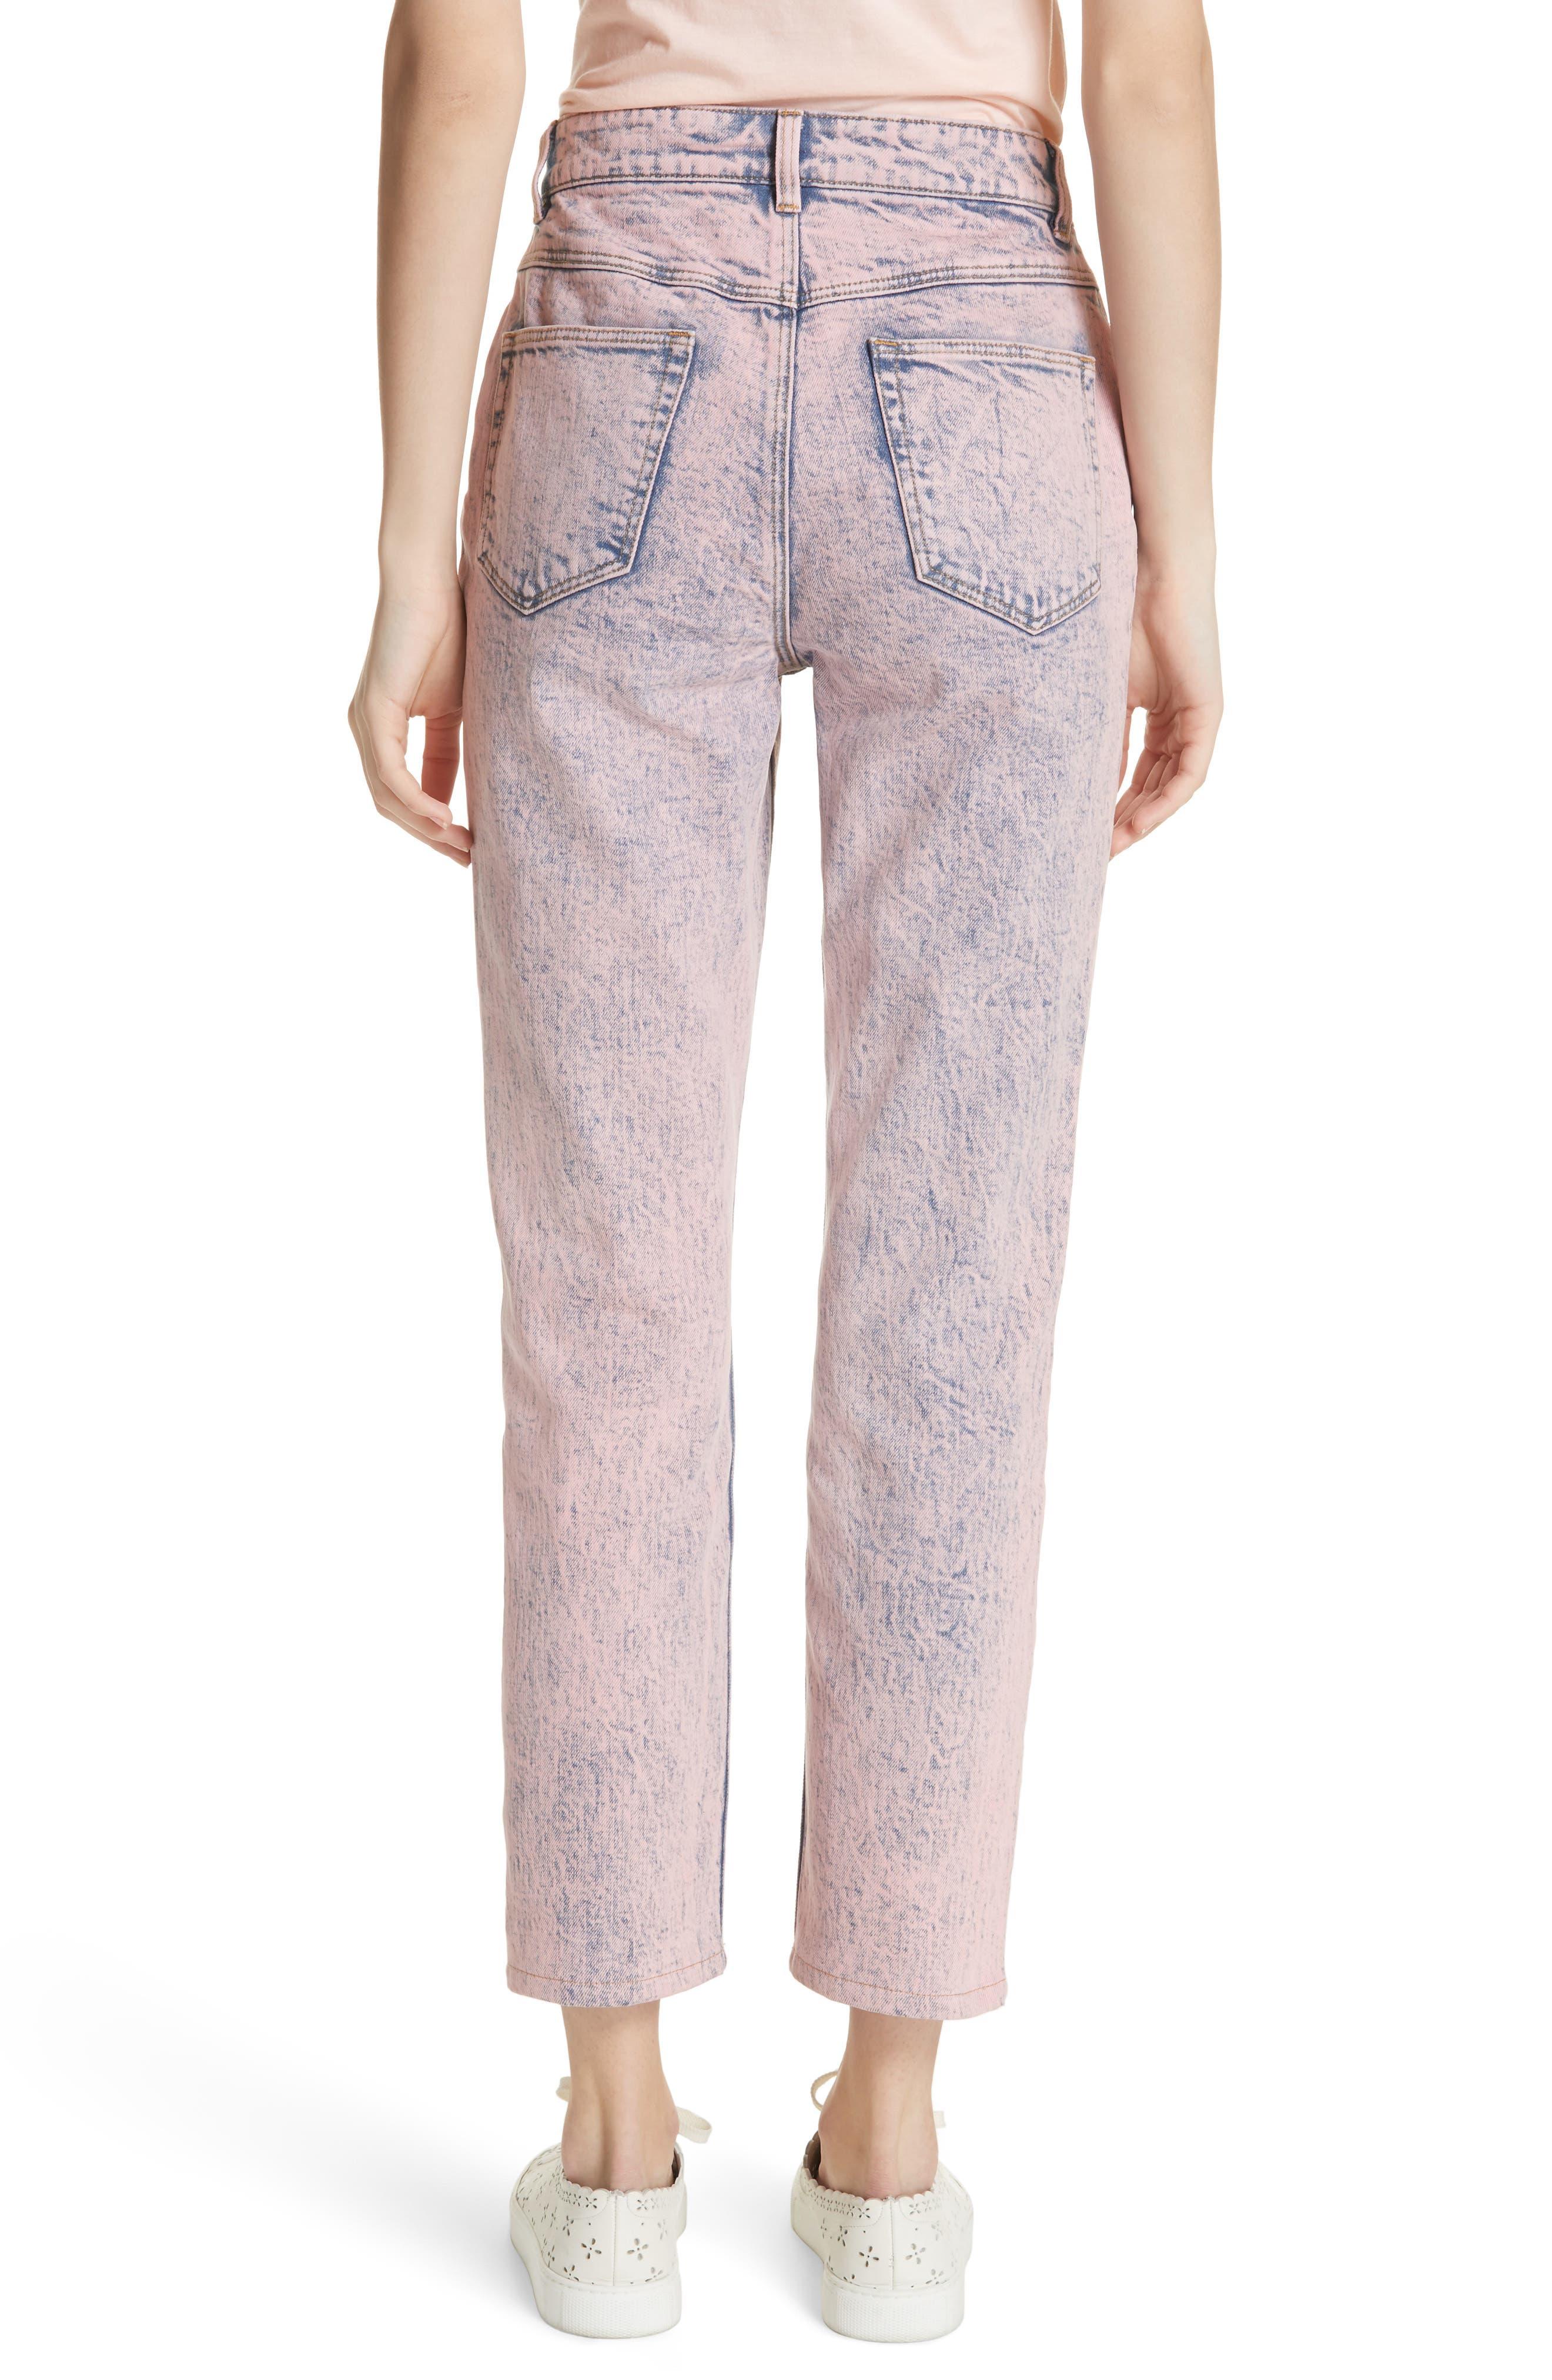 Ines Acid Wash Crop Jeans,                             Alternate thumbnail 2, color,                             Pink Overdyed Acid Wash